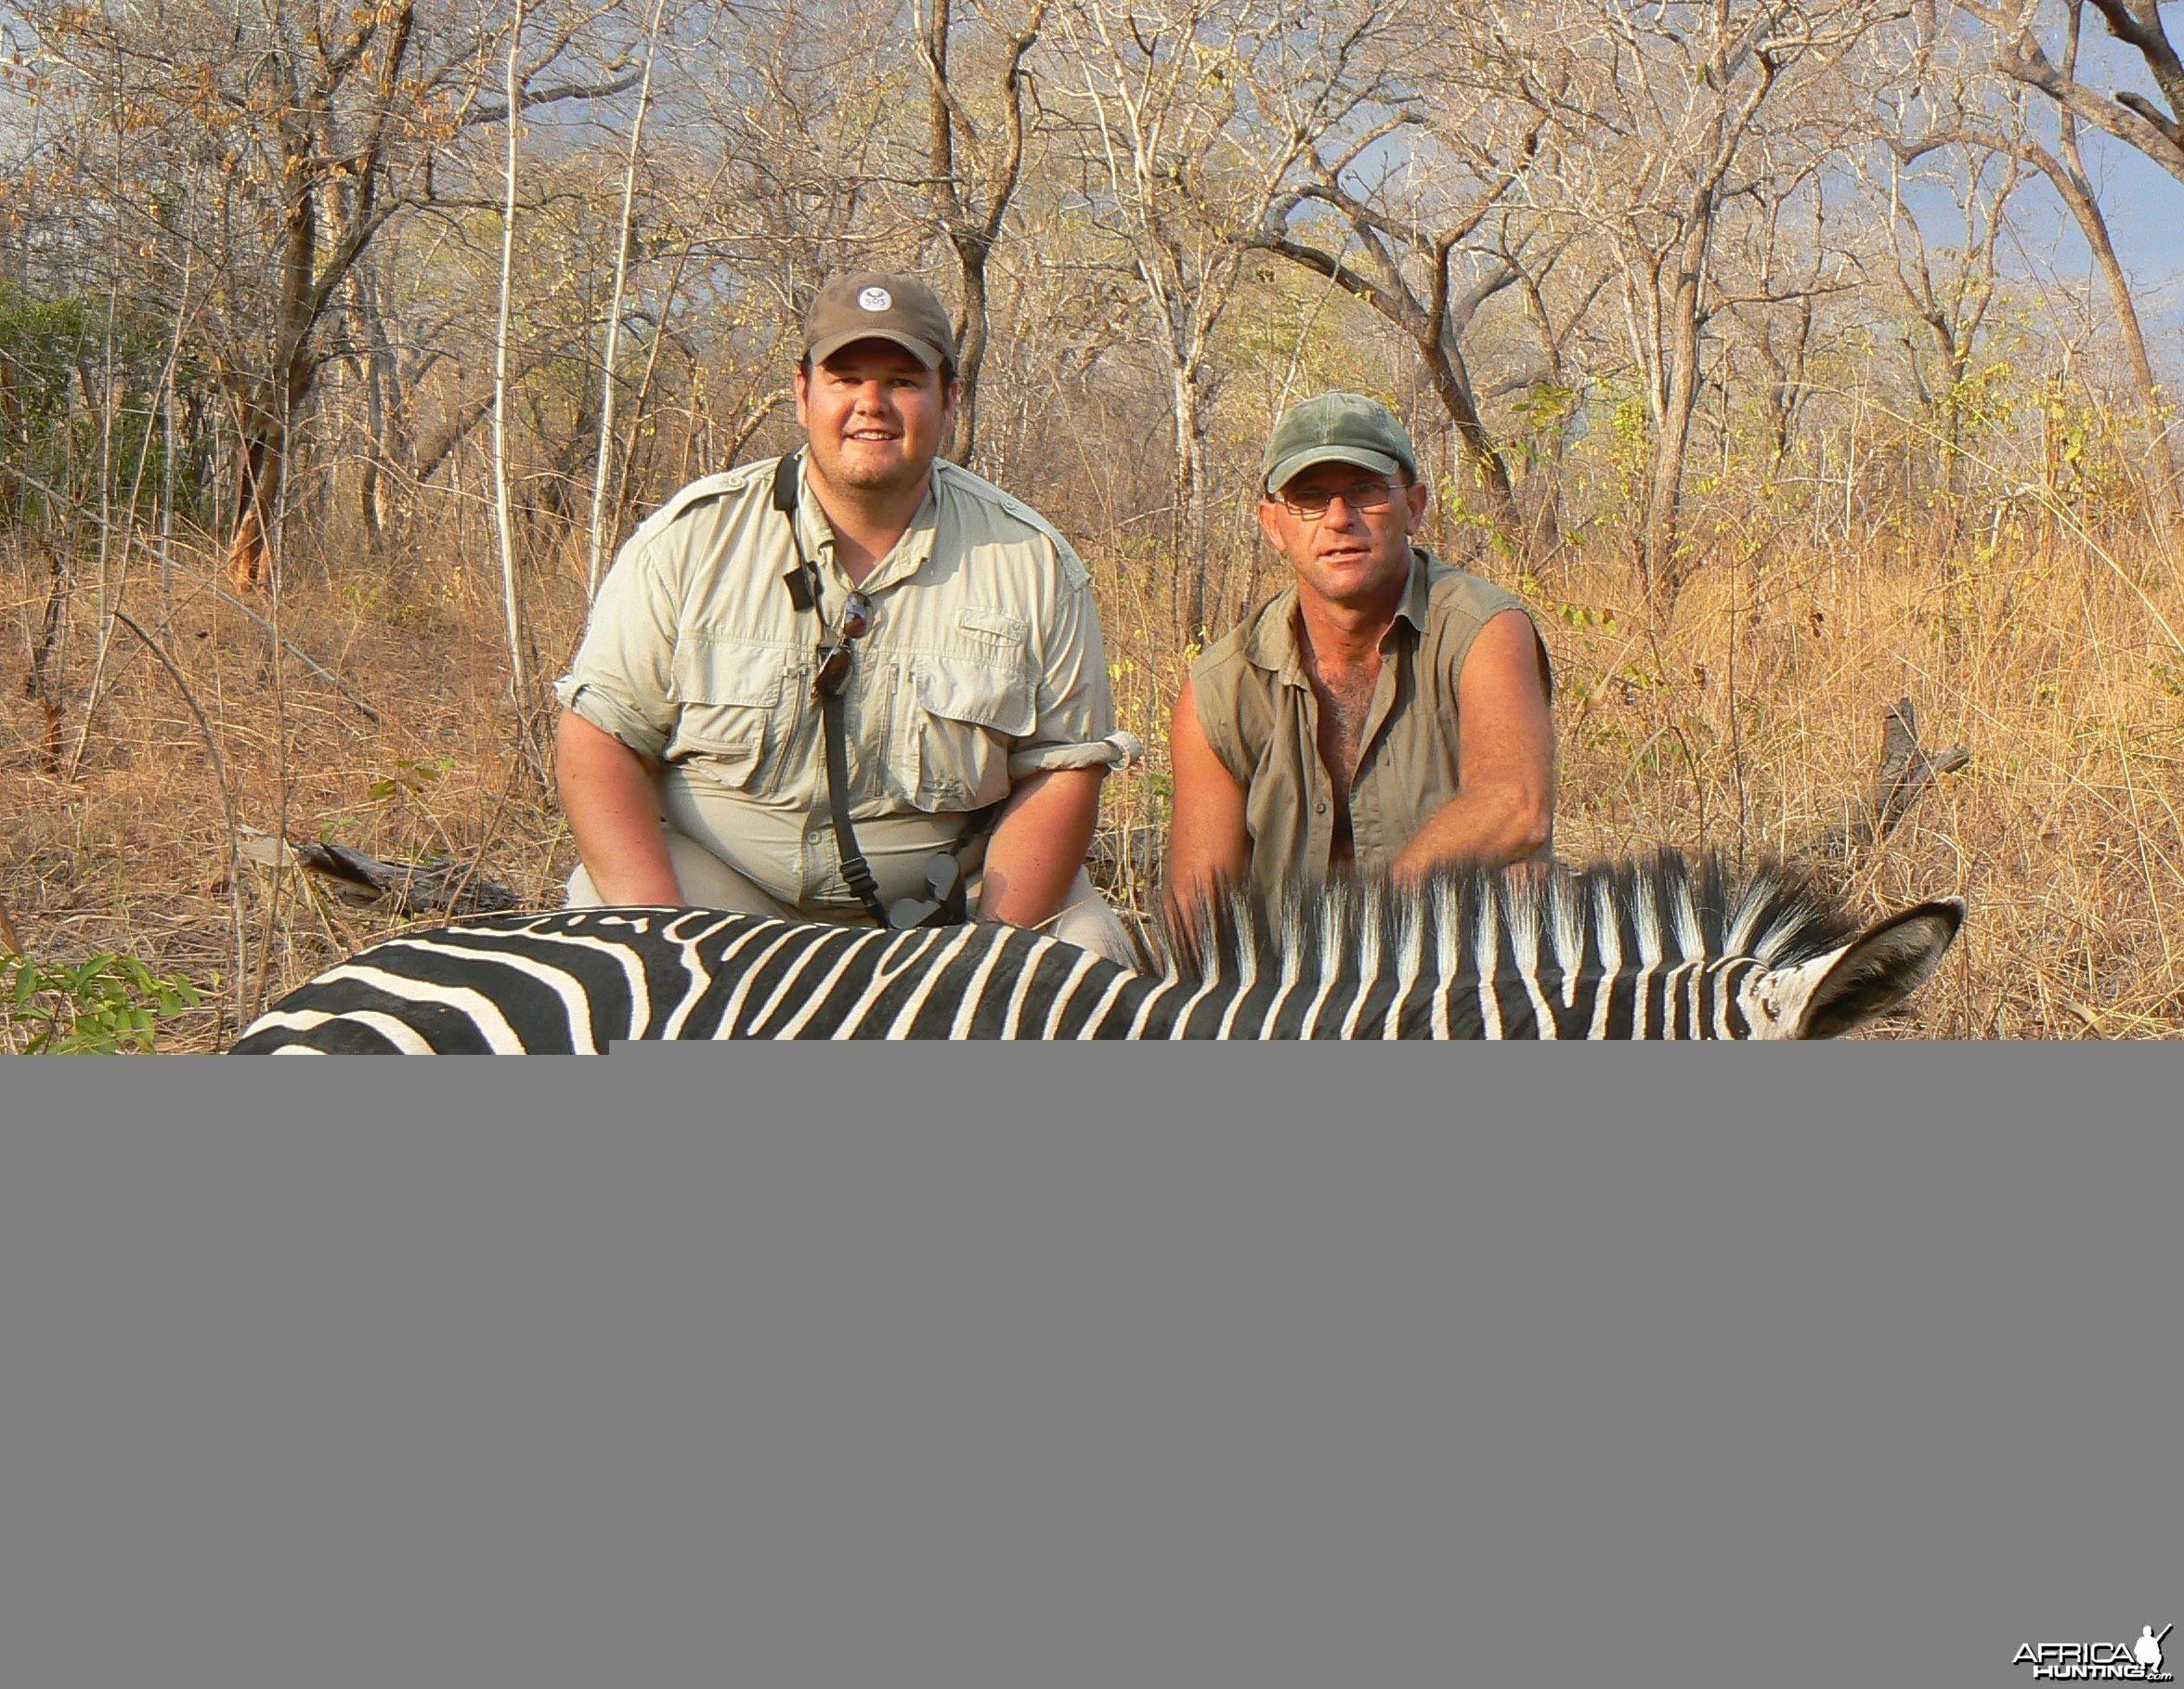 Zebra from Tanzania